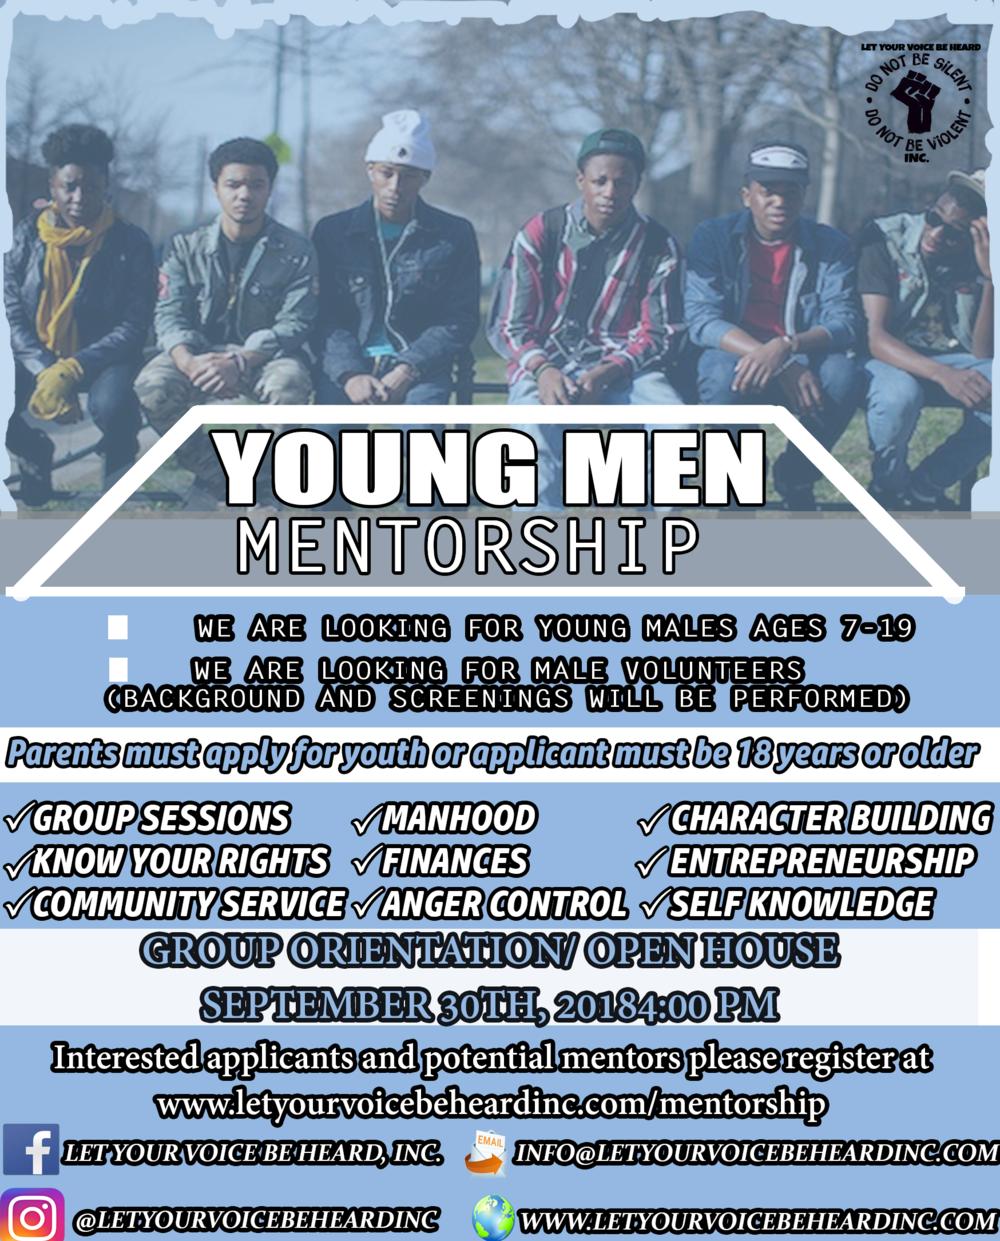 YOUTH MEN MENTORSHIP.png